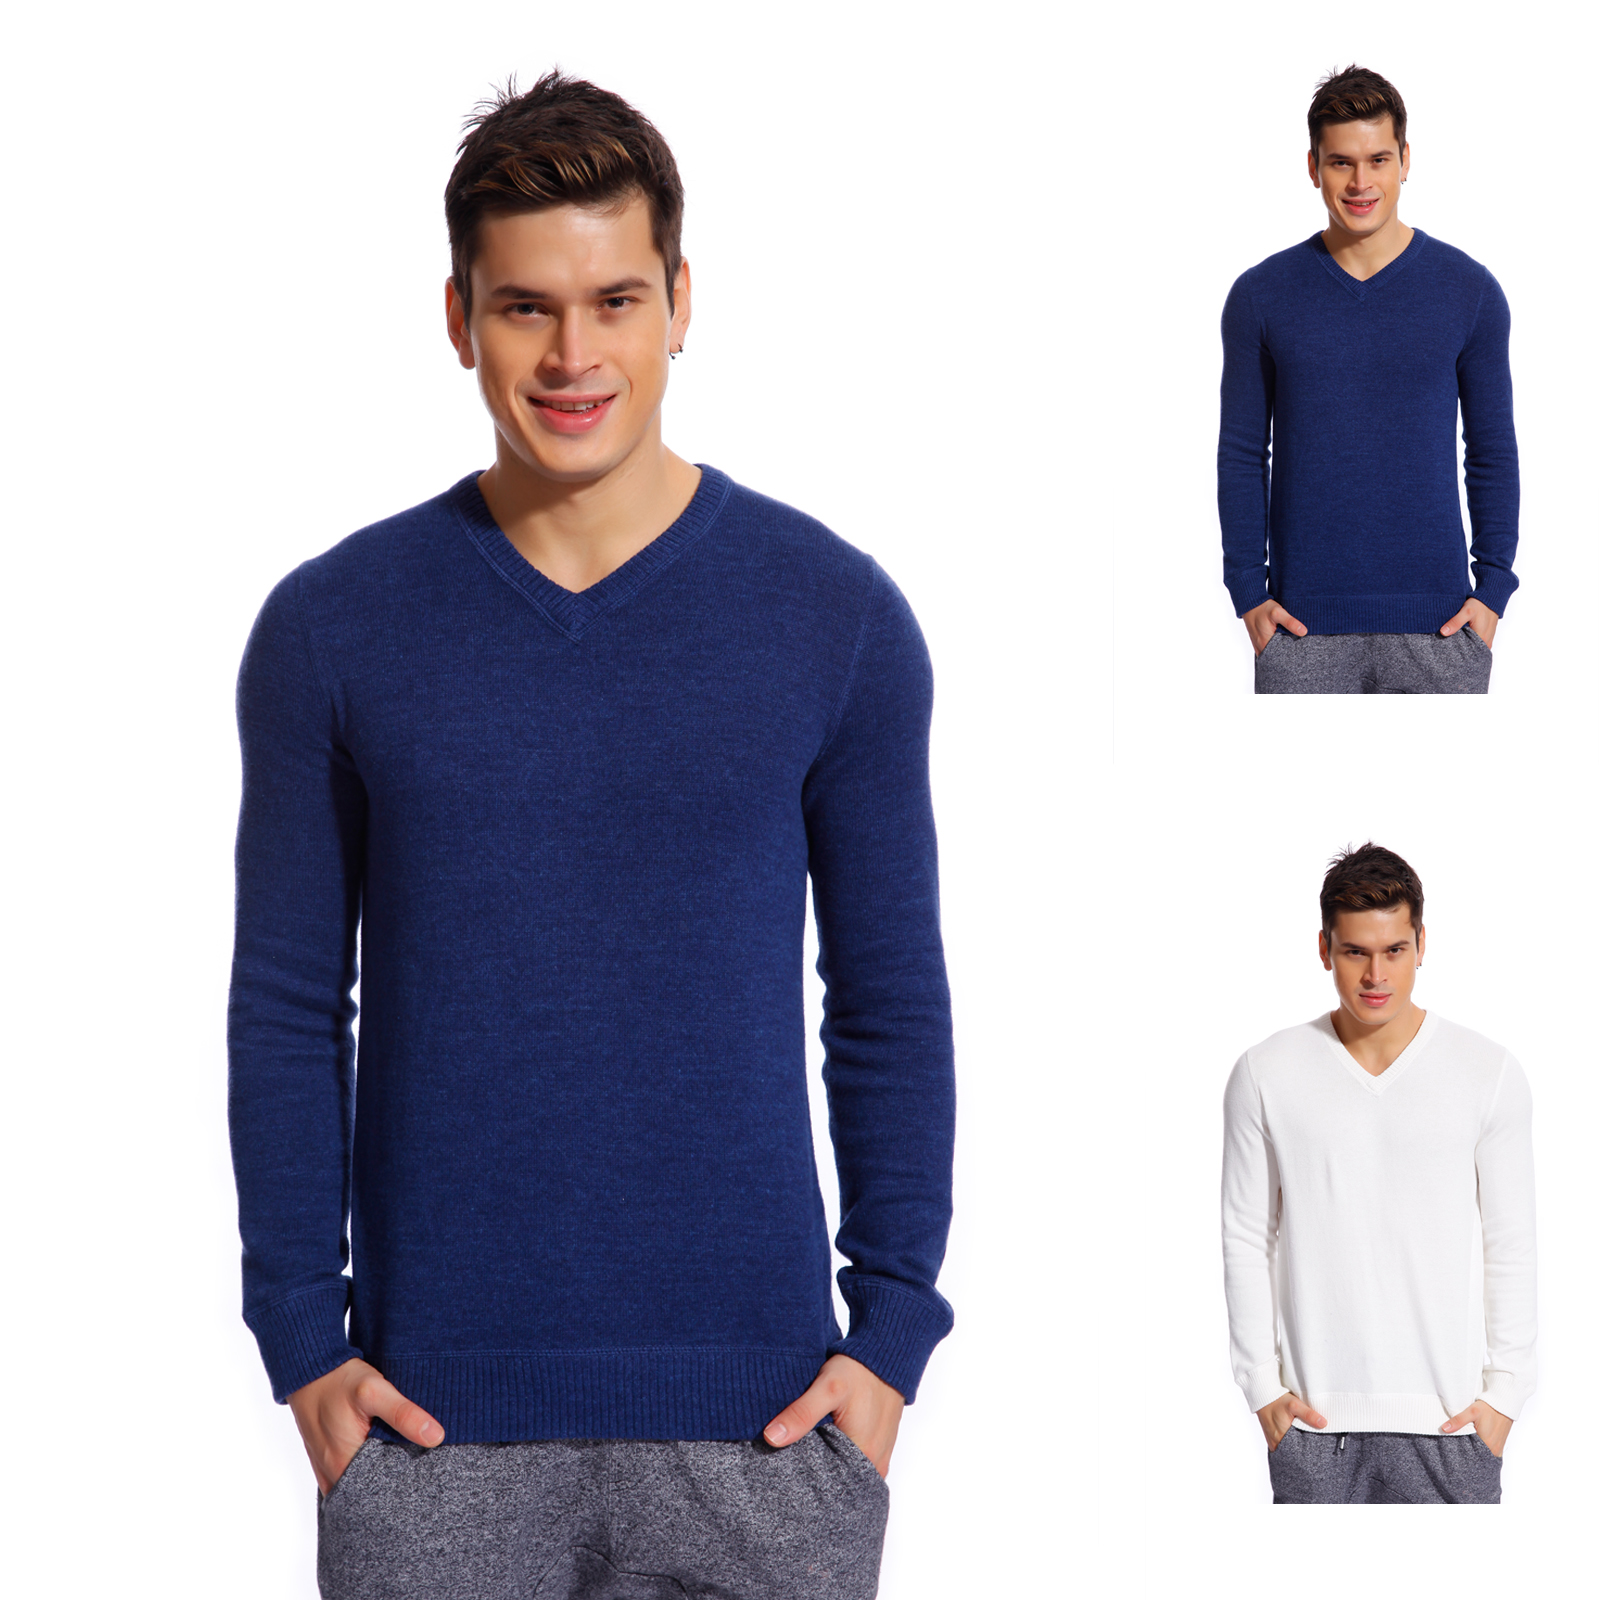 Copperside Mens 100% Cotton V-Neck Sweater | eBay